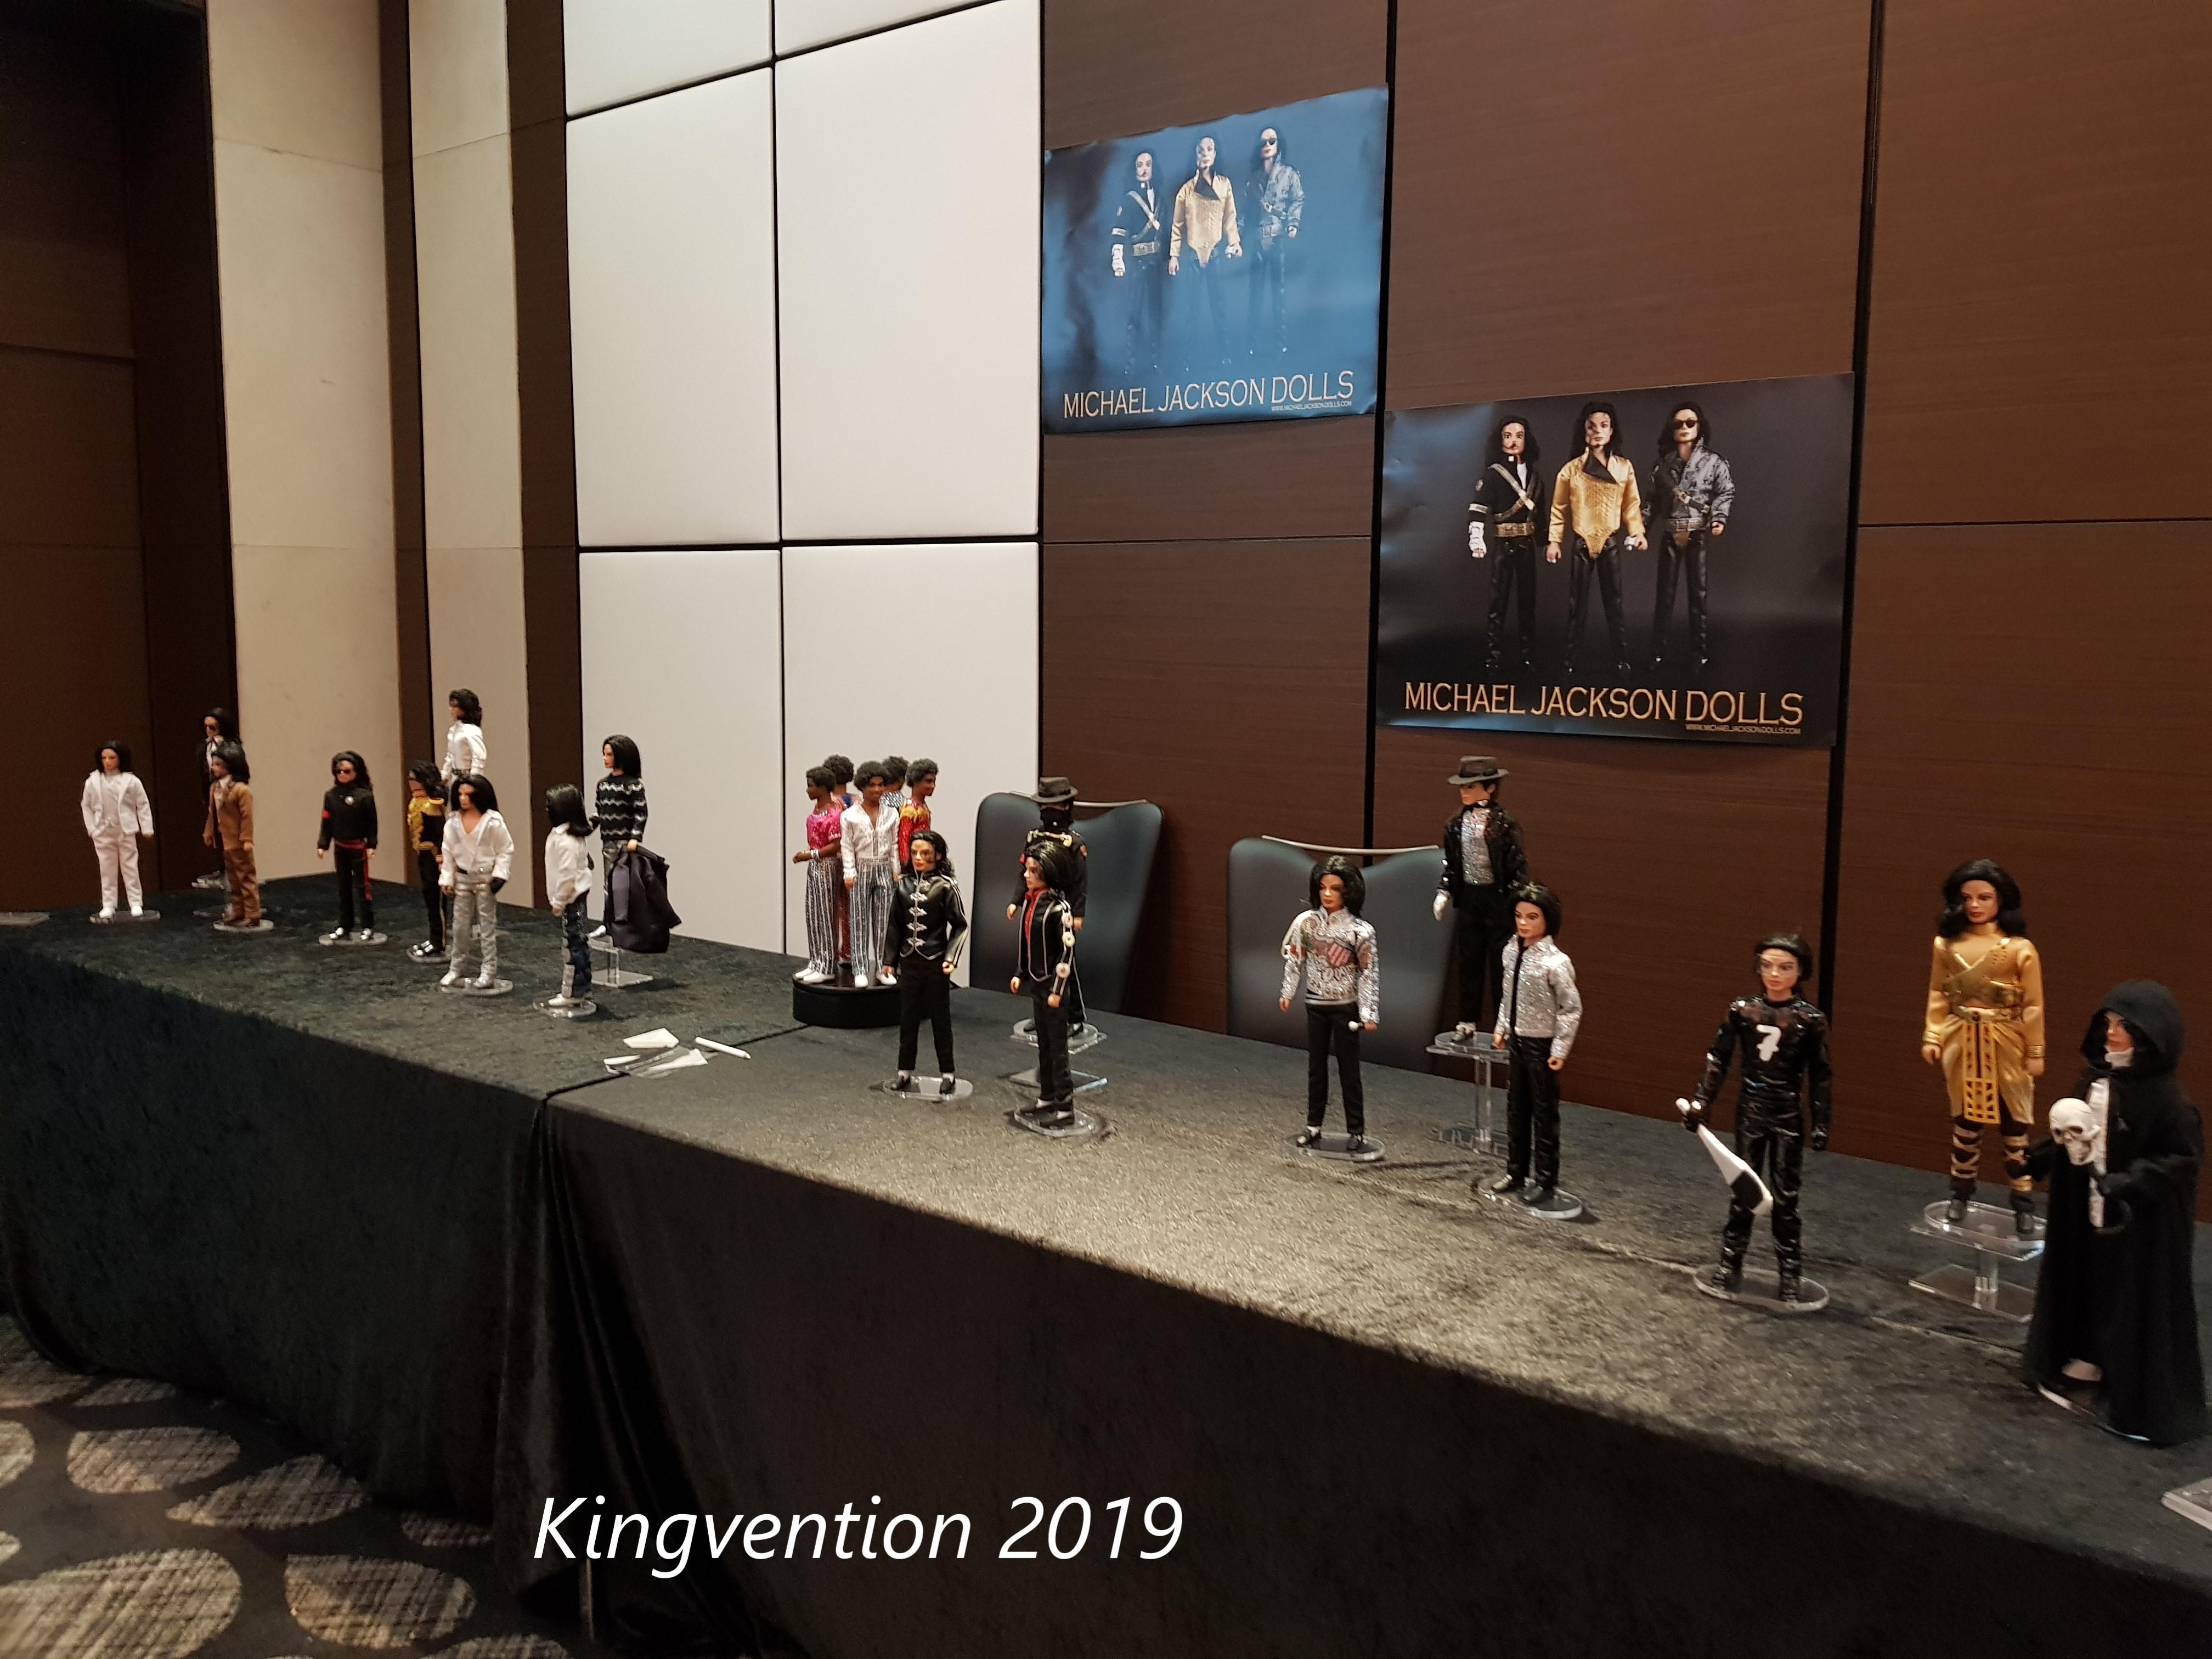 Kingvention 2019